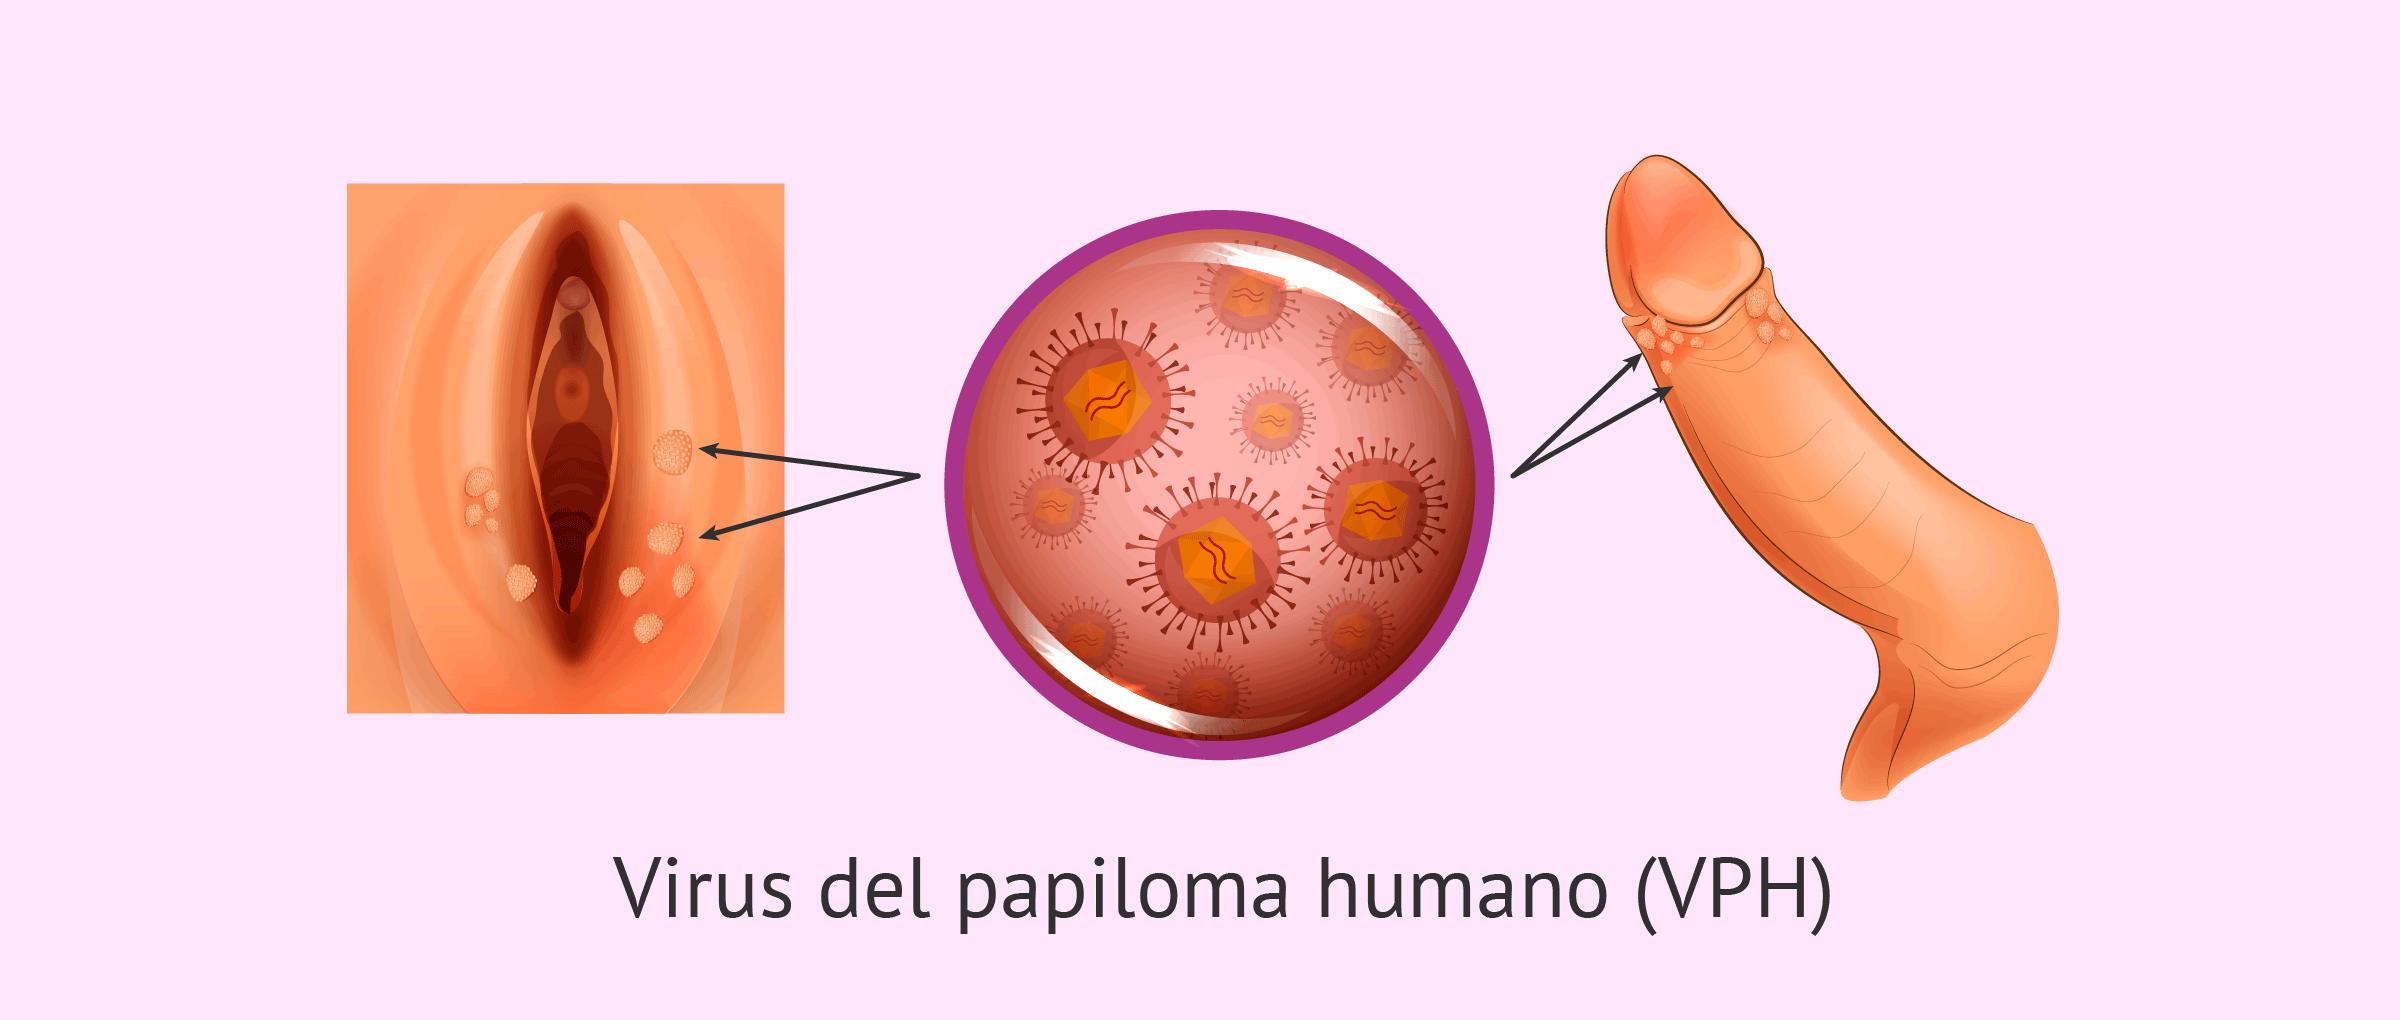 virus del papiloma humano complicaciones